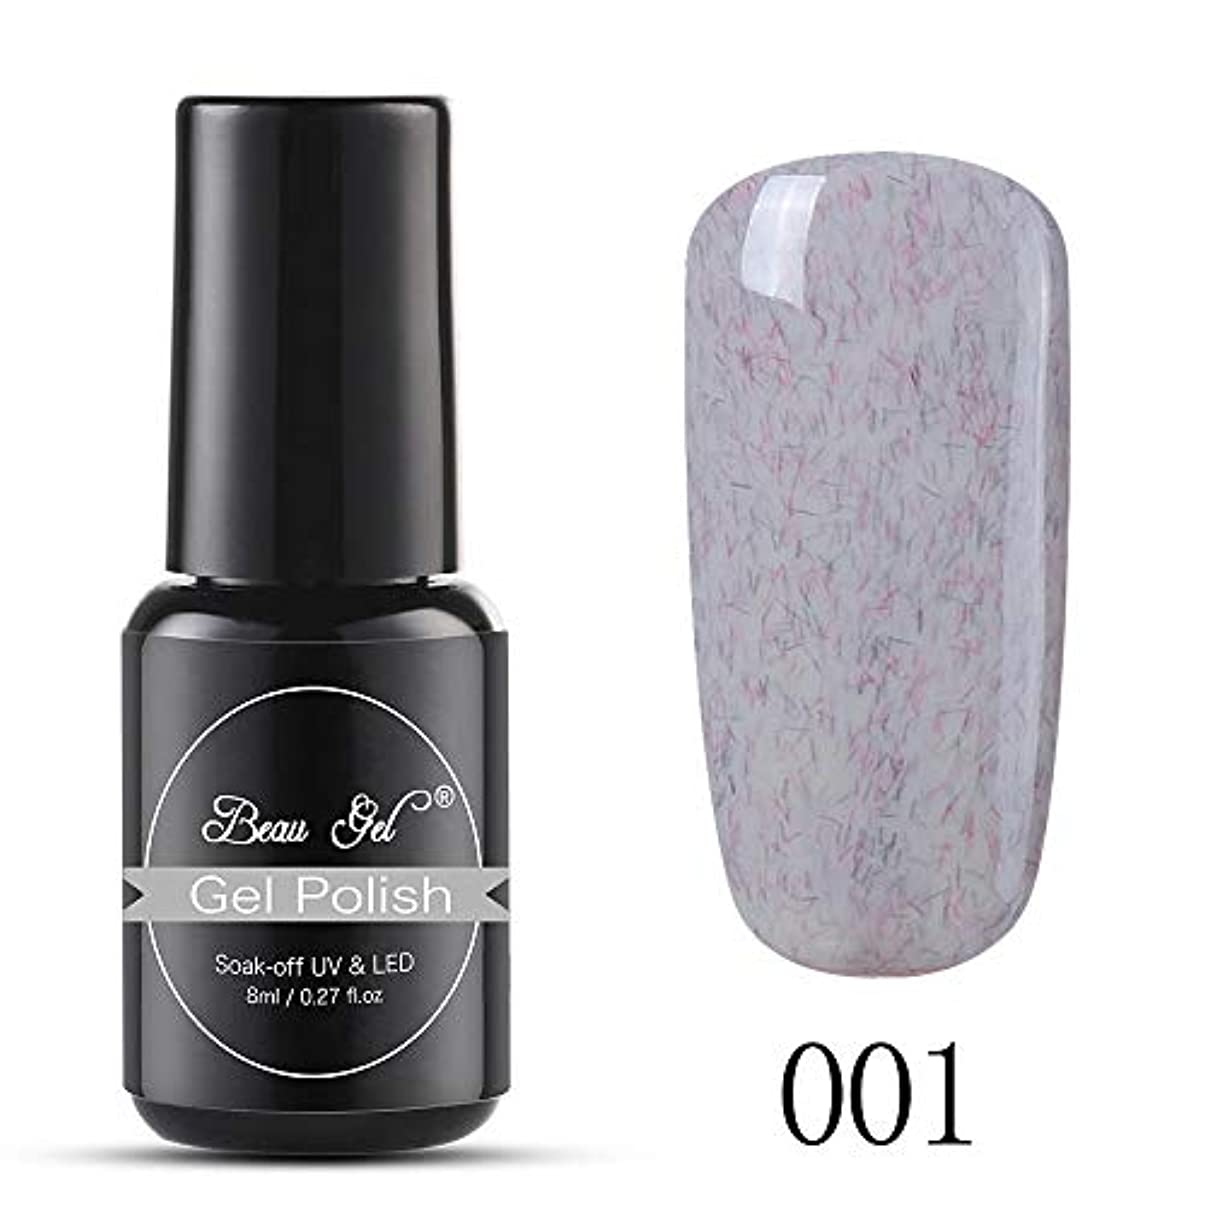 Beau gel ジェルネイル カラージェル 皮草系 1色入り 8ml-001